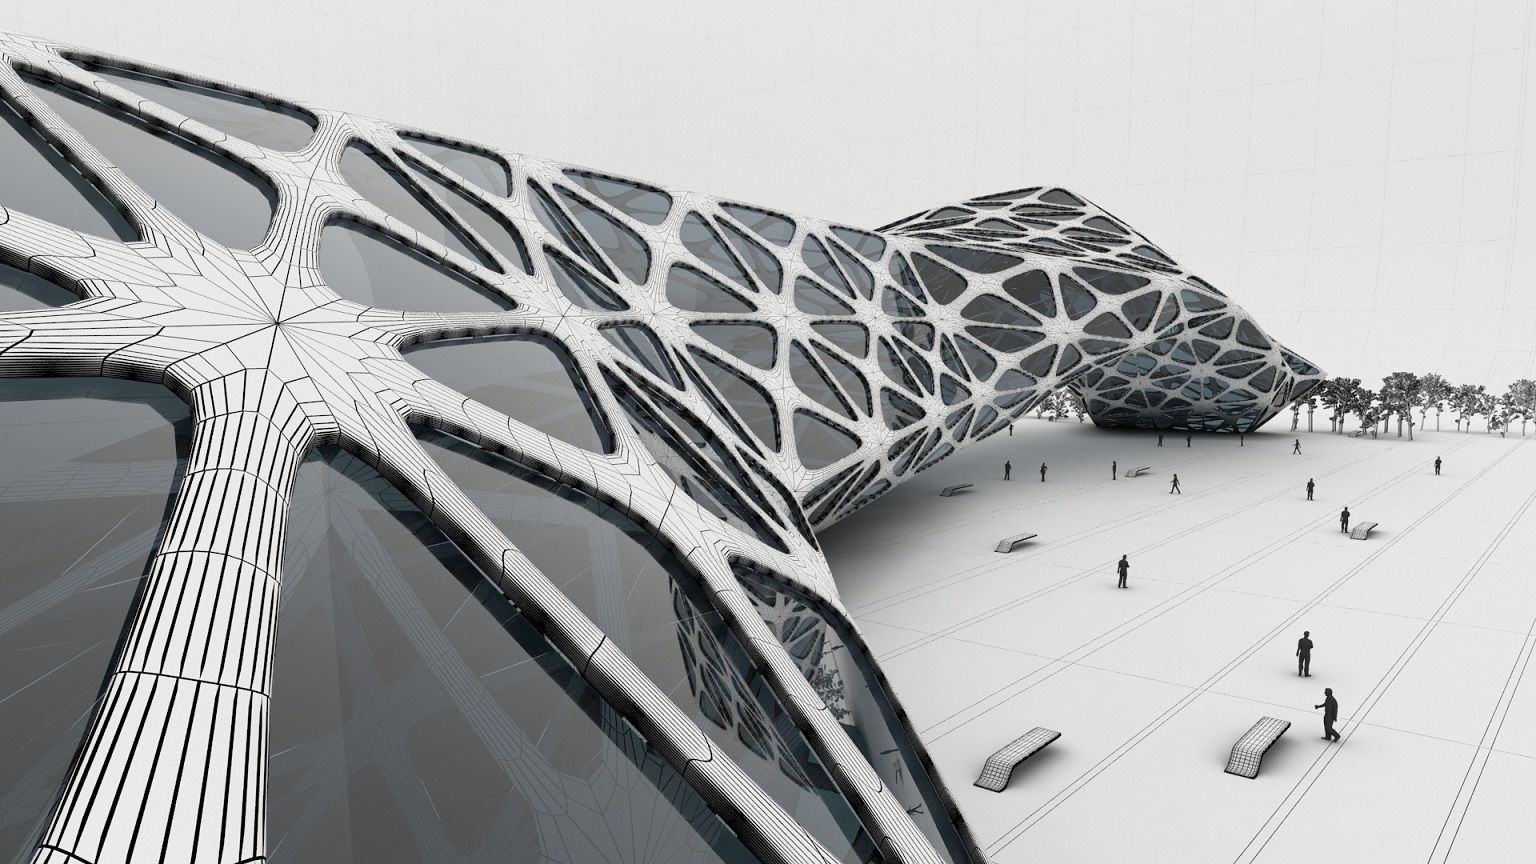 Parametric design google search design language for Architecture design language